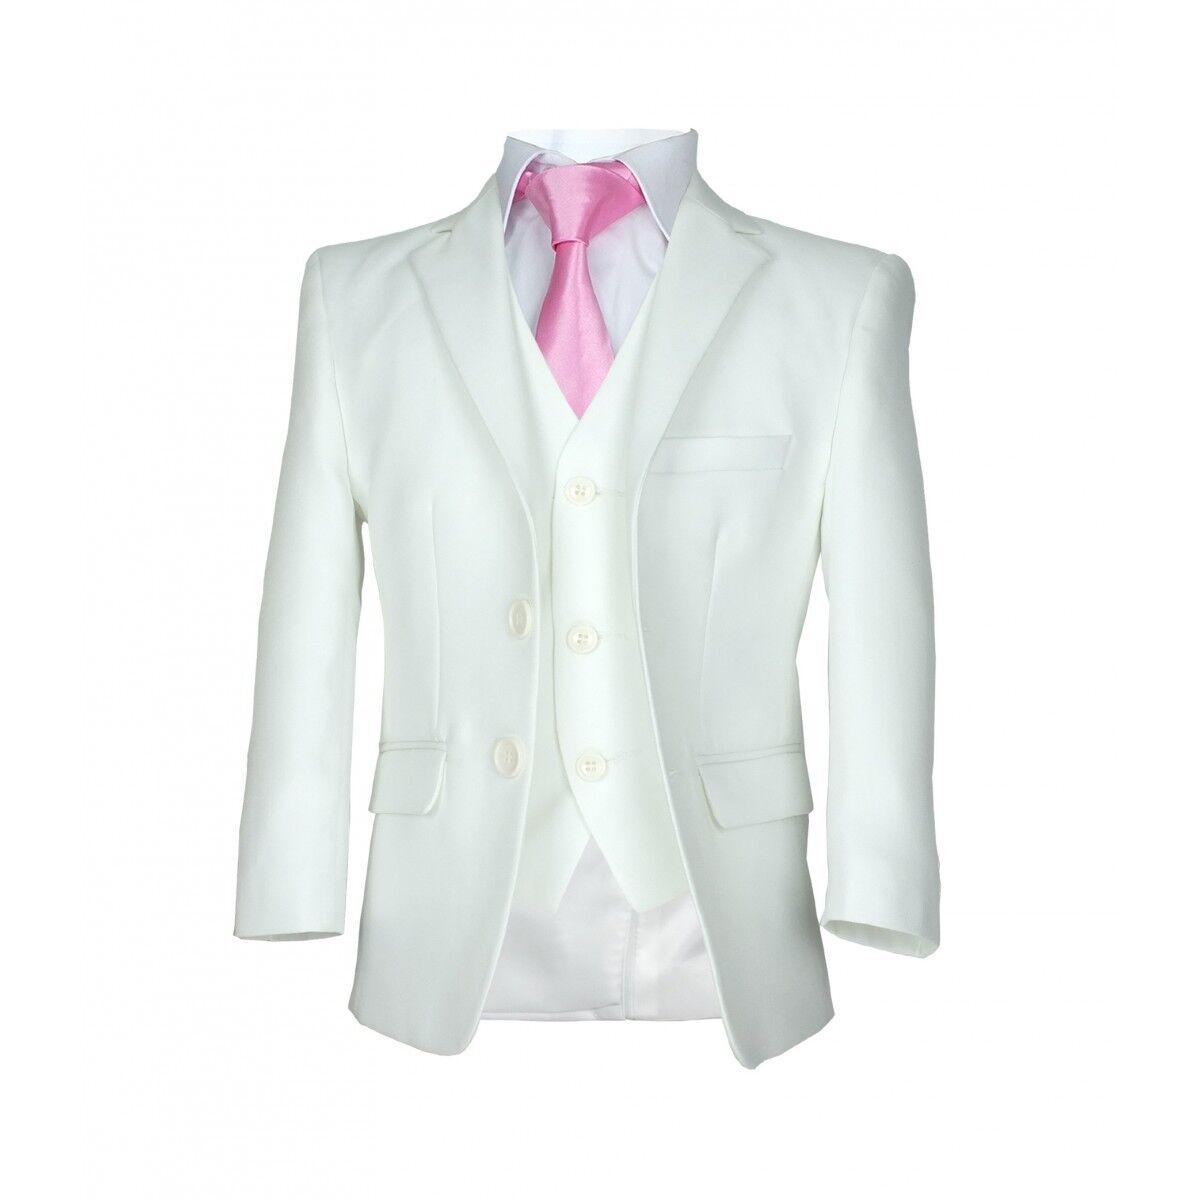 Boys Formal Ivory Communion Suit Italian Wedding Page Boy